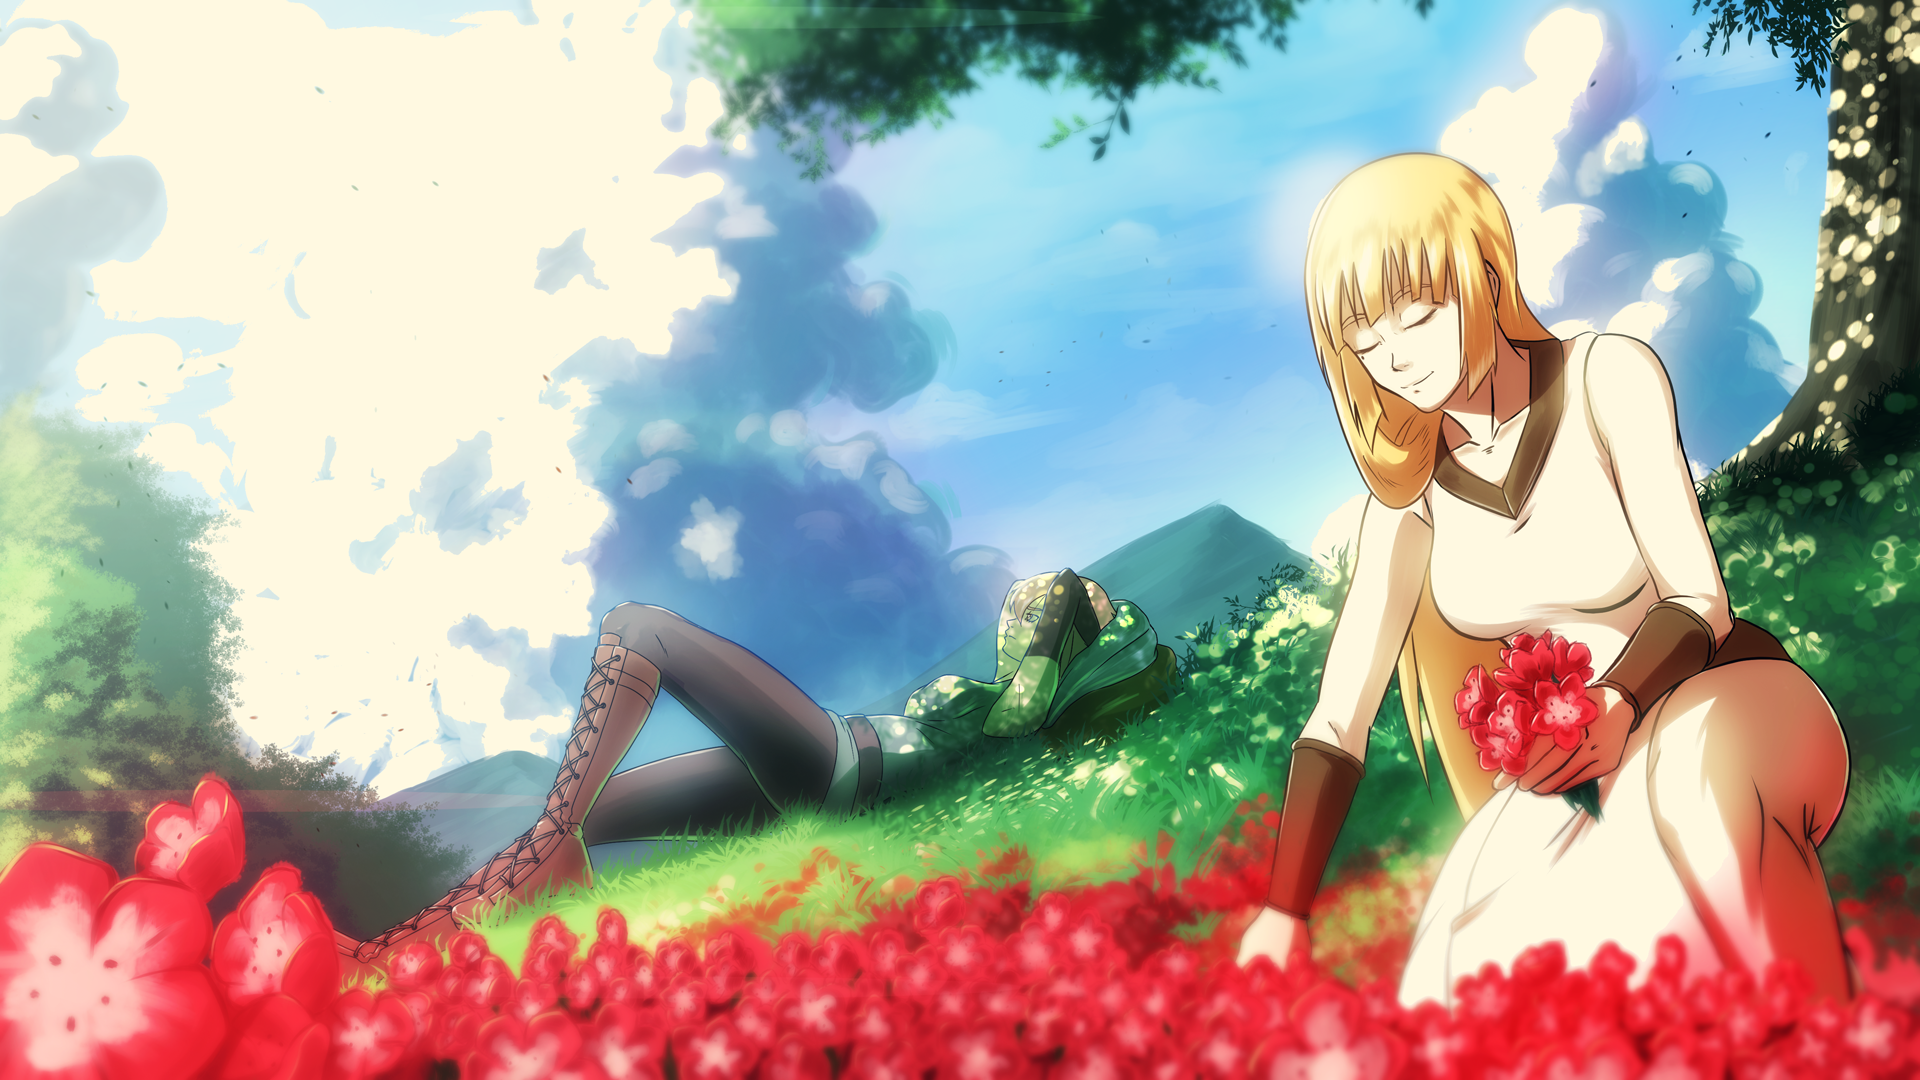 flower-picking-scene-ap-2.png